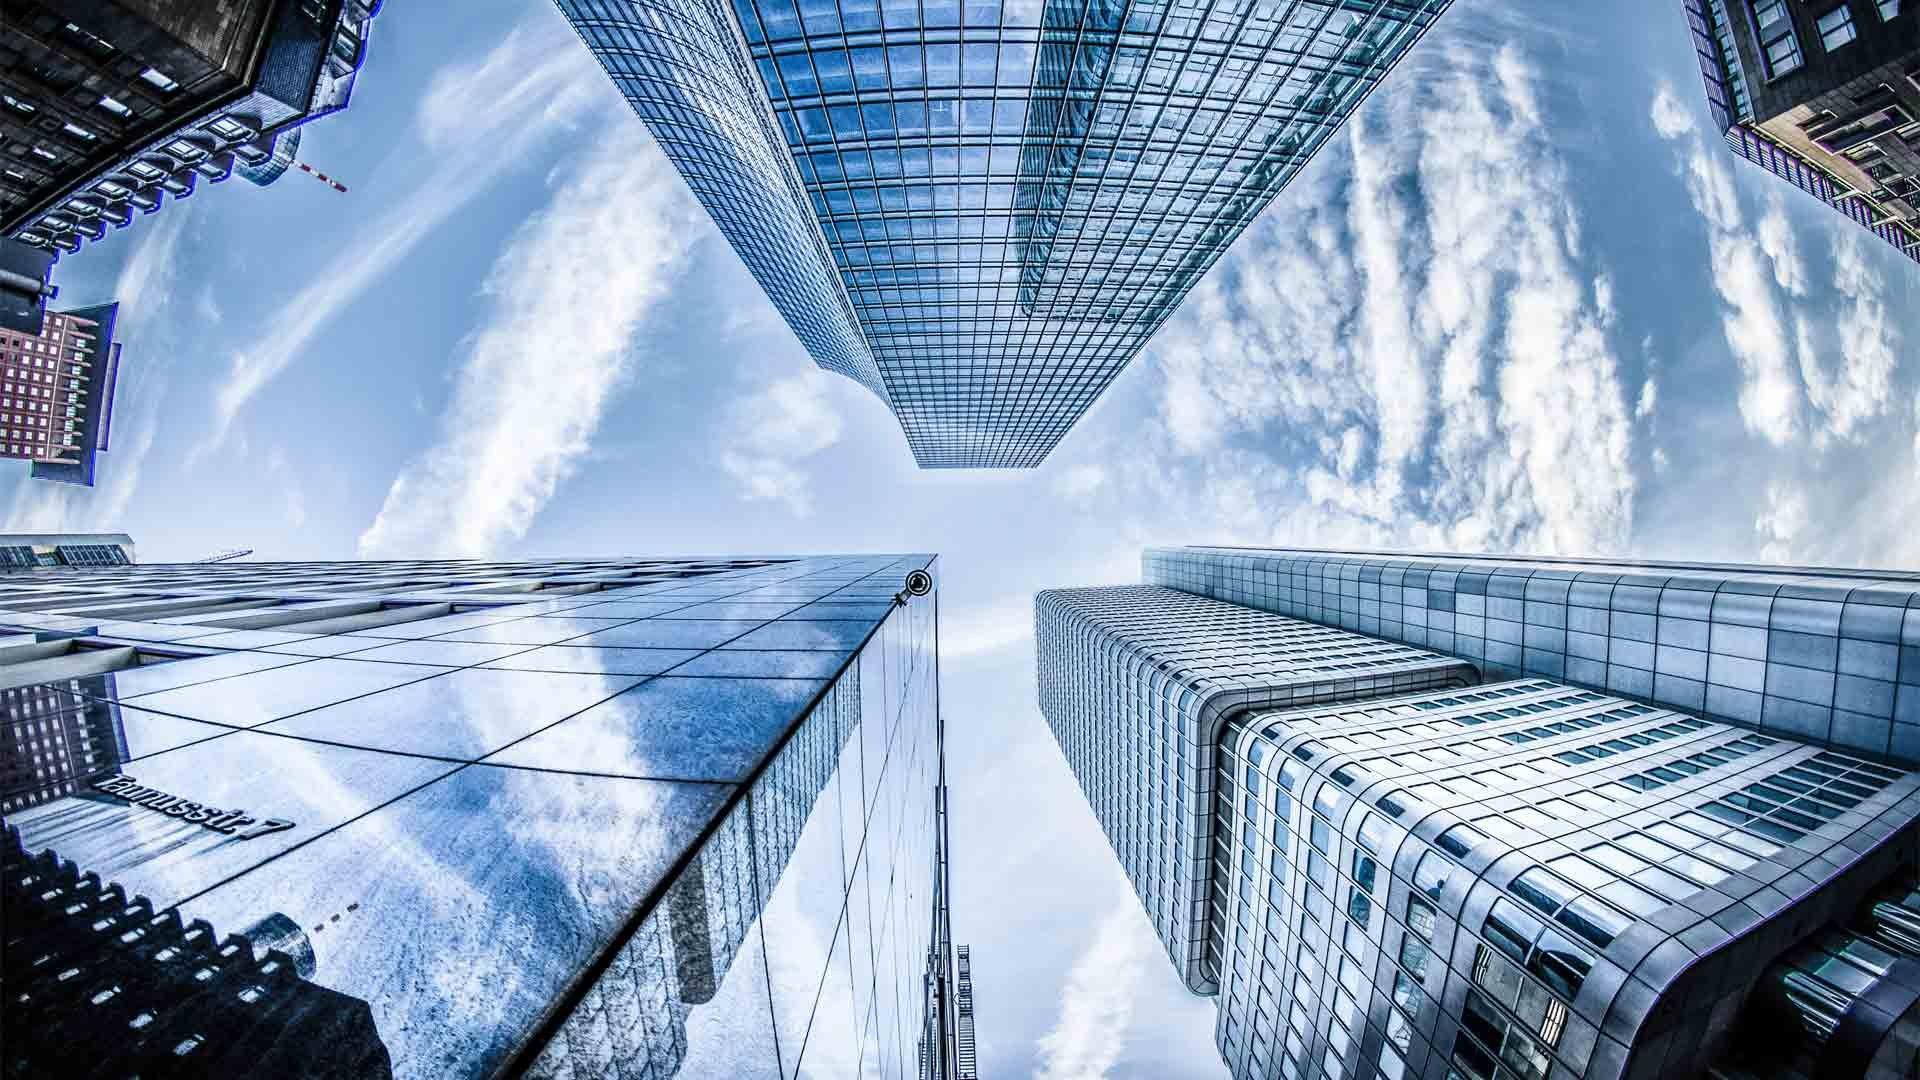 Niente più limiti al Retail Management con la tecnologia Cloud